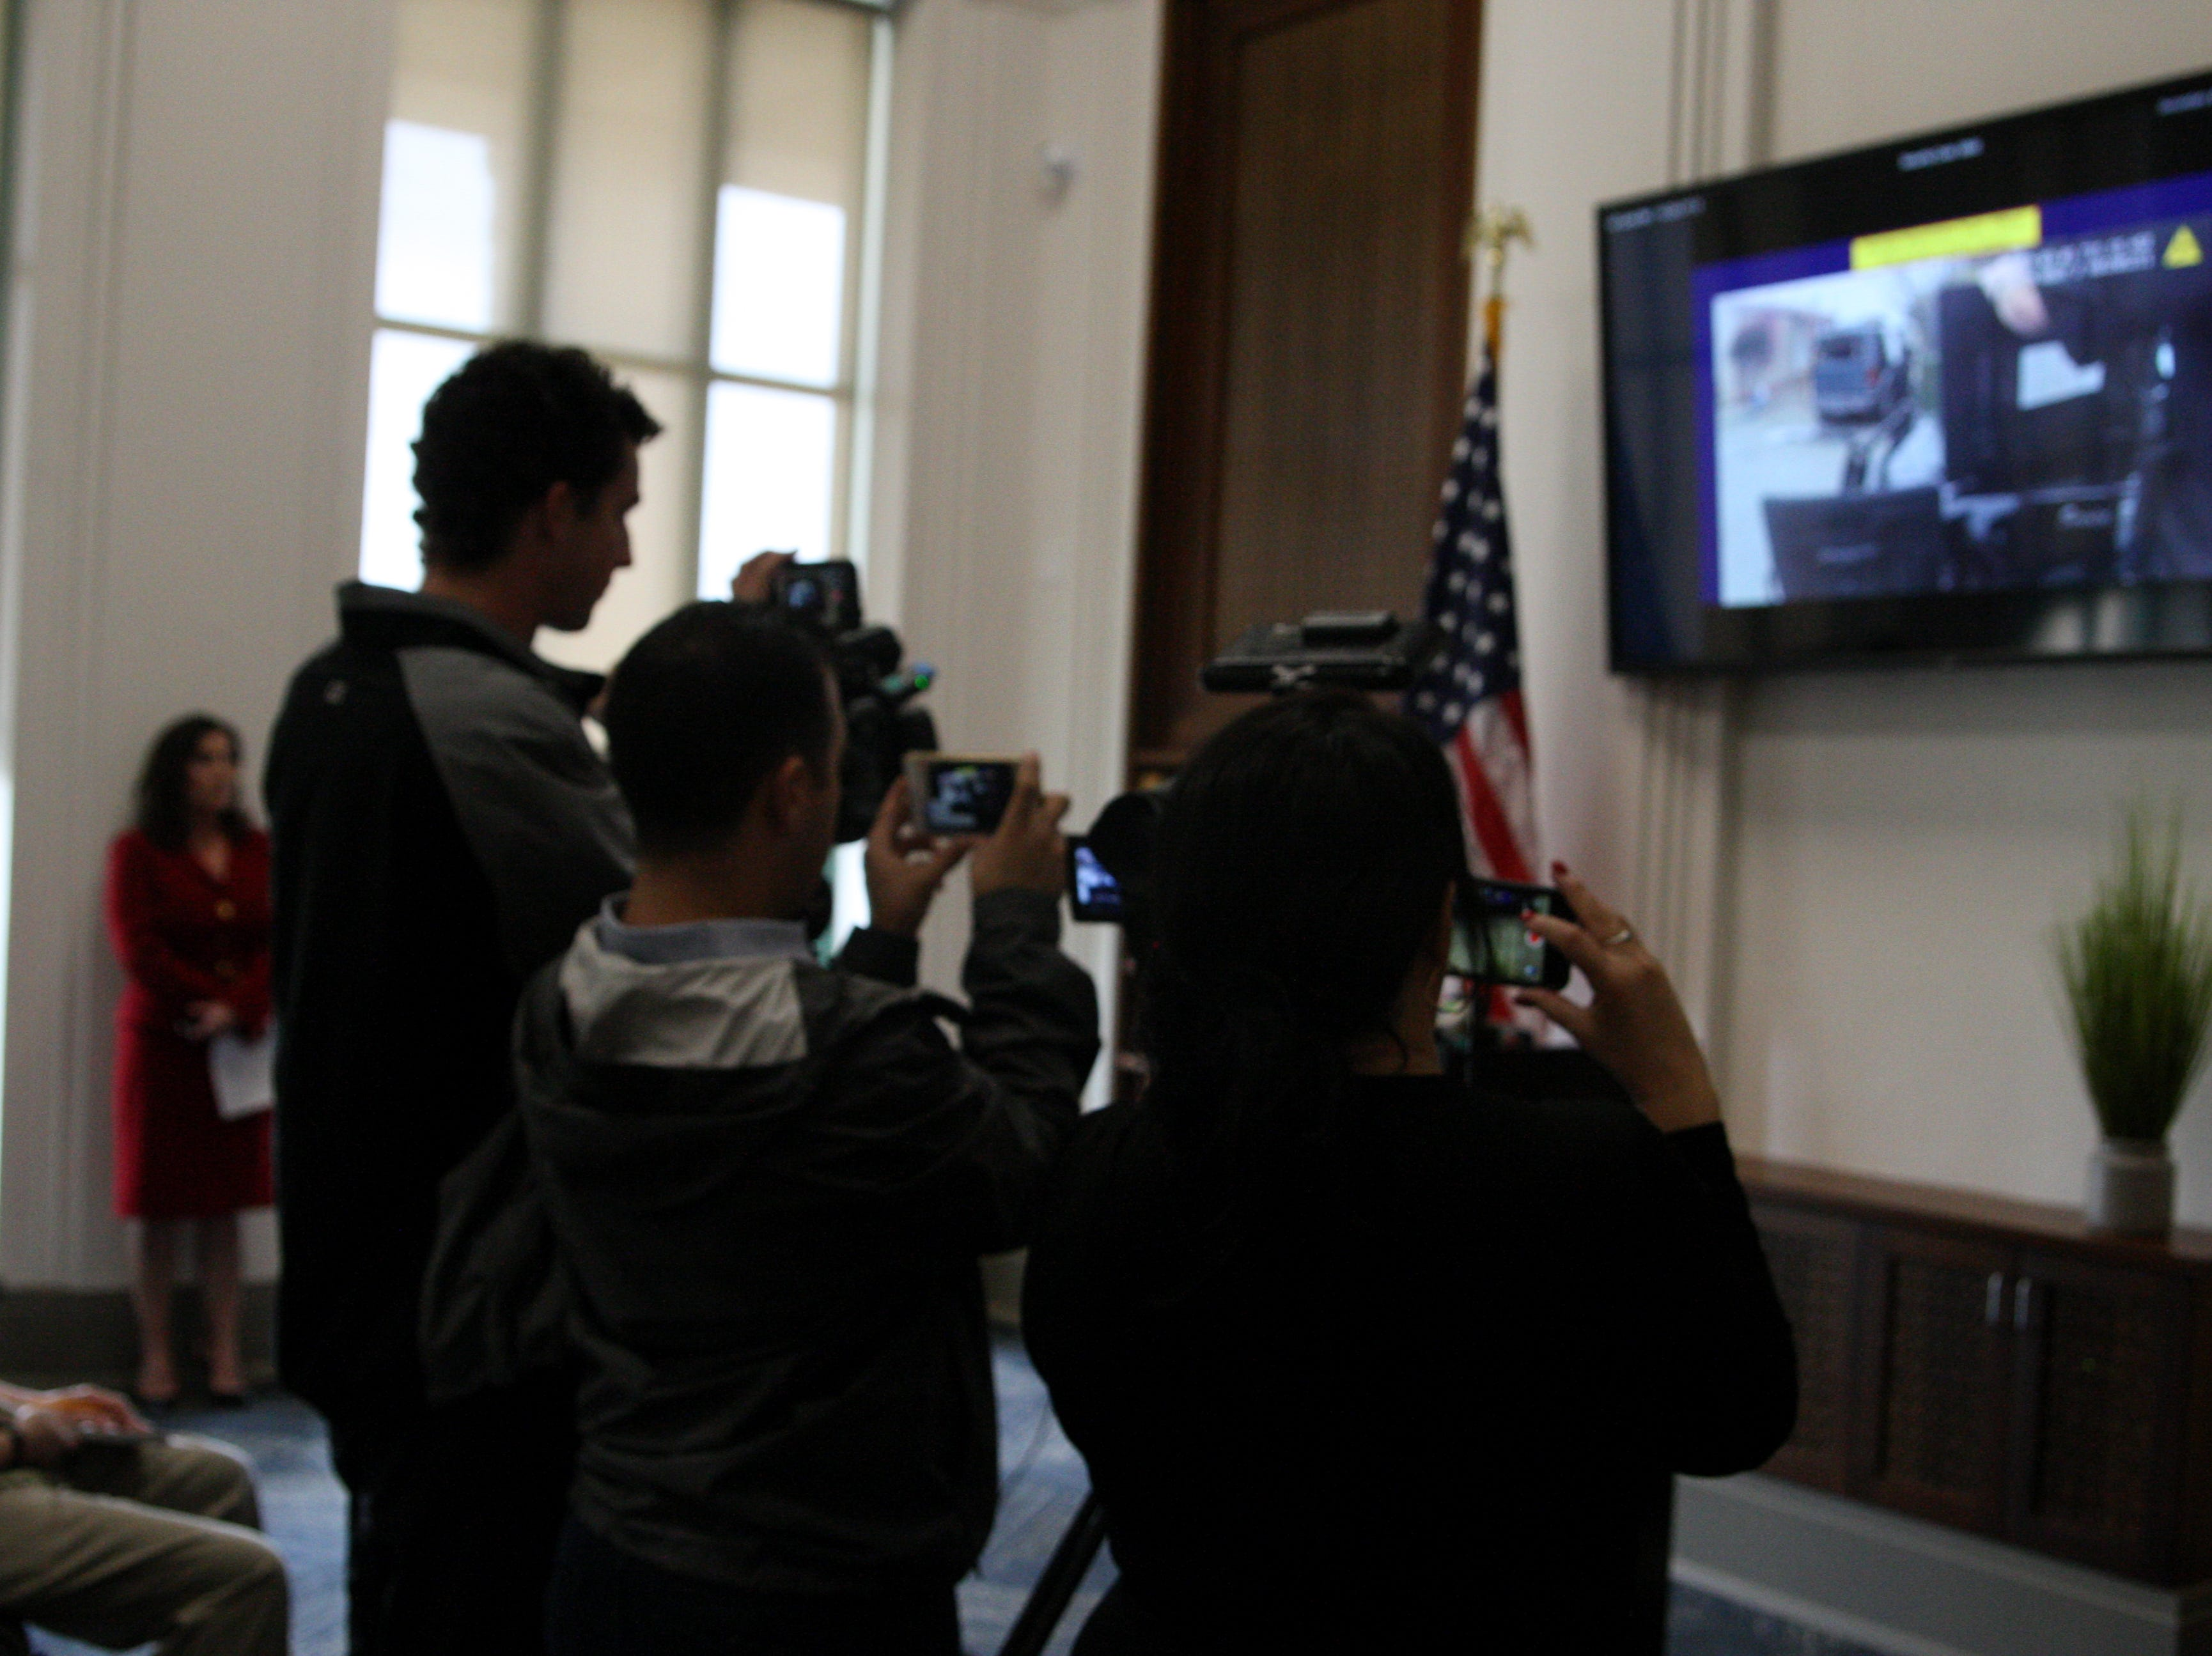 Reporters film the body camera footage of the shooting death of Brenda Mendoza, aka Brenda Rodriguez. April 2, 2019.